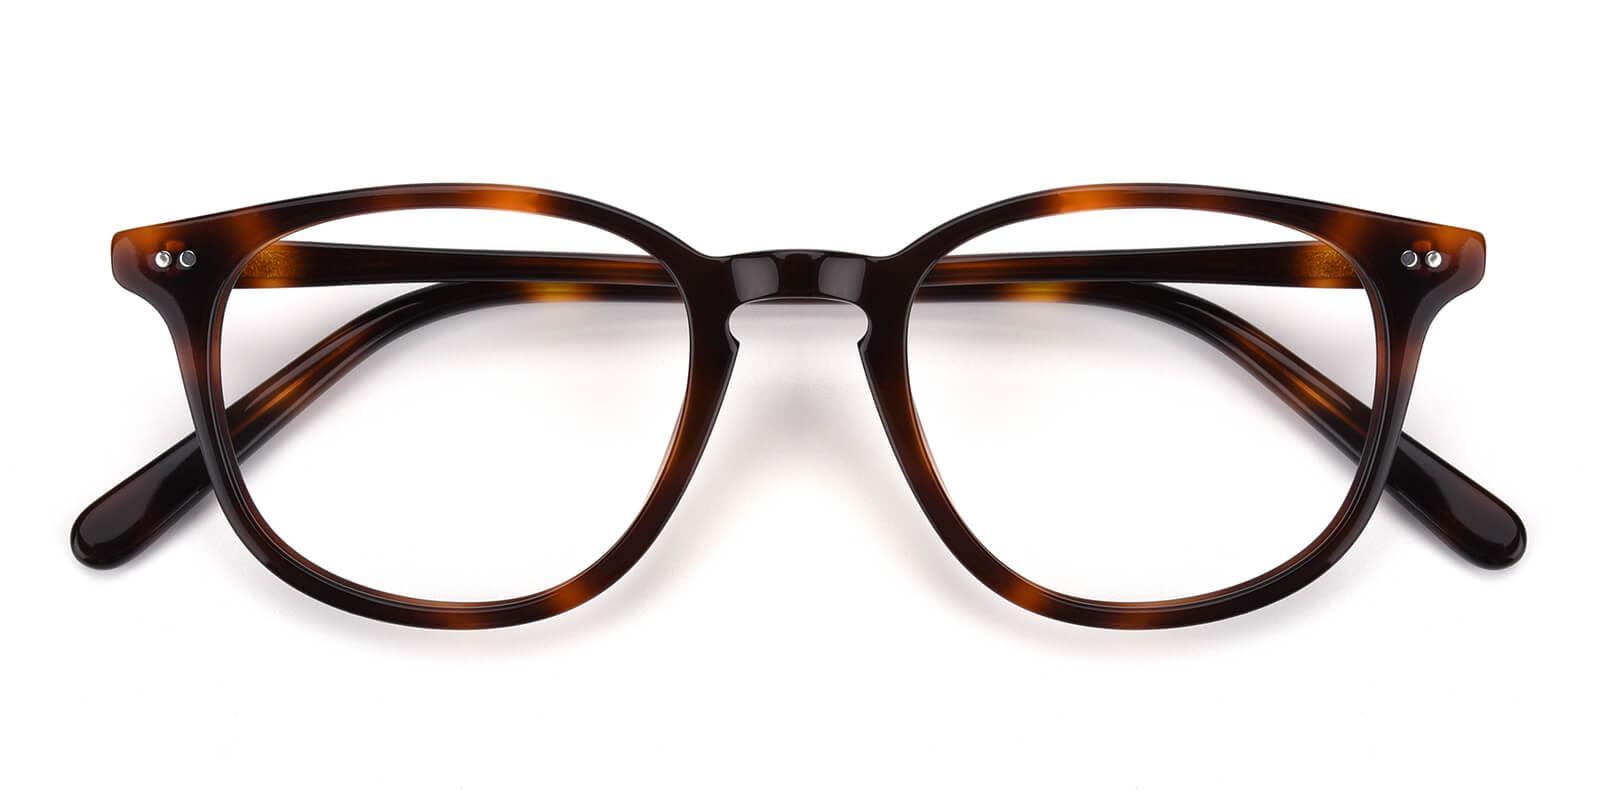 Trendiary-Tortoise-Square-Acetate-Eyeglasses-detail